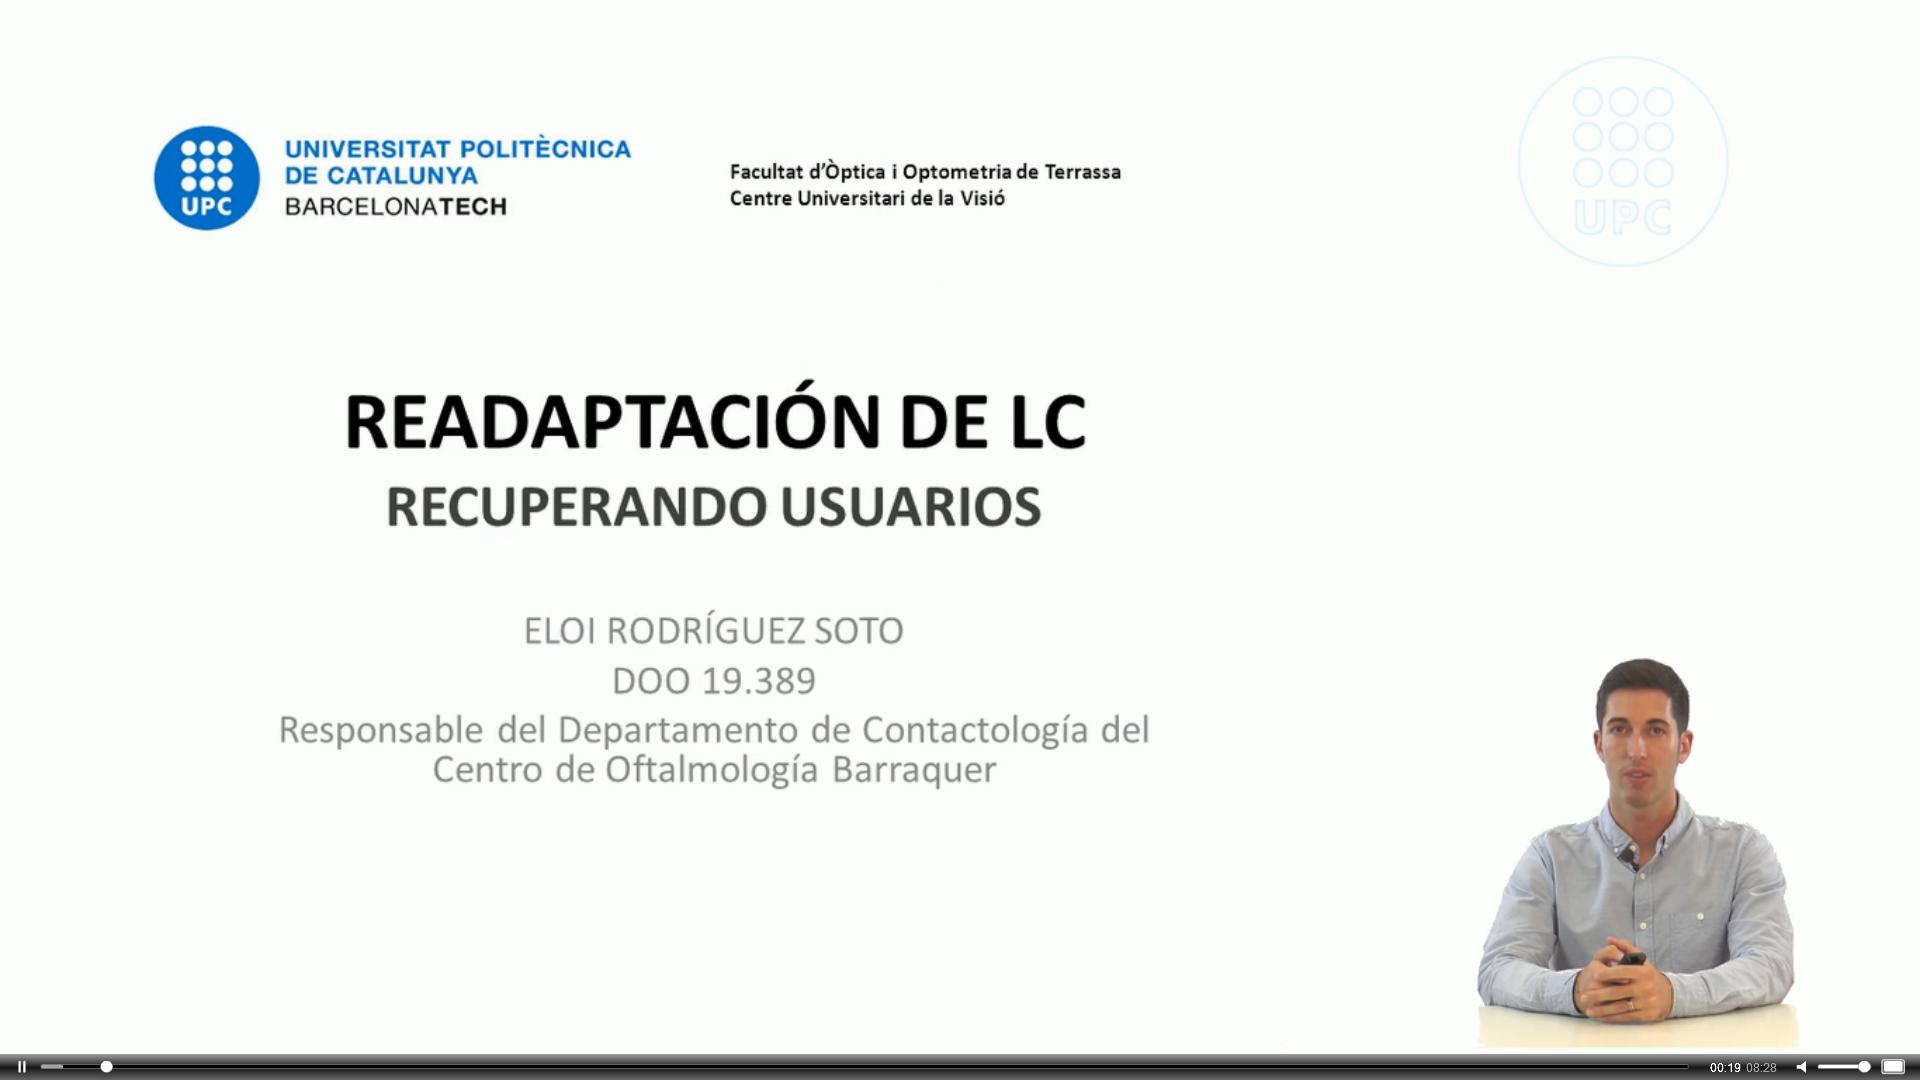 JLC2016_readaptacion_LC(Eloi_Rodriguez)